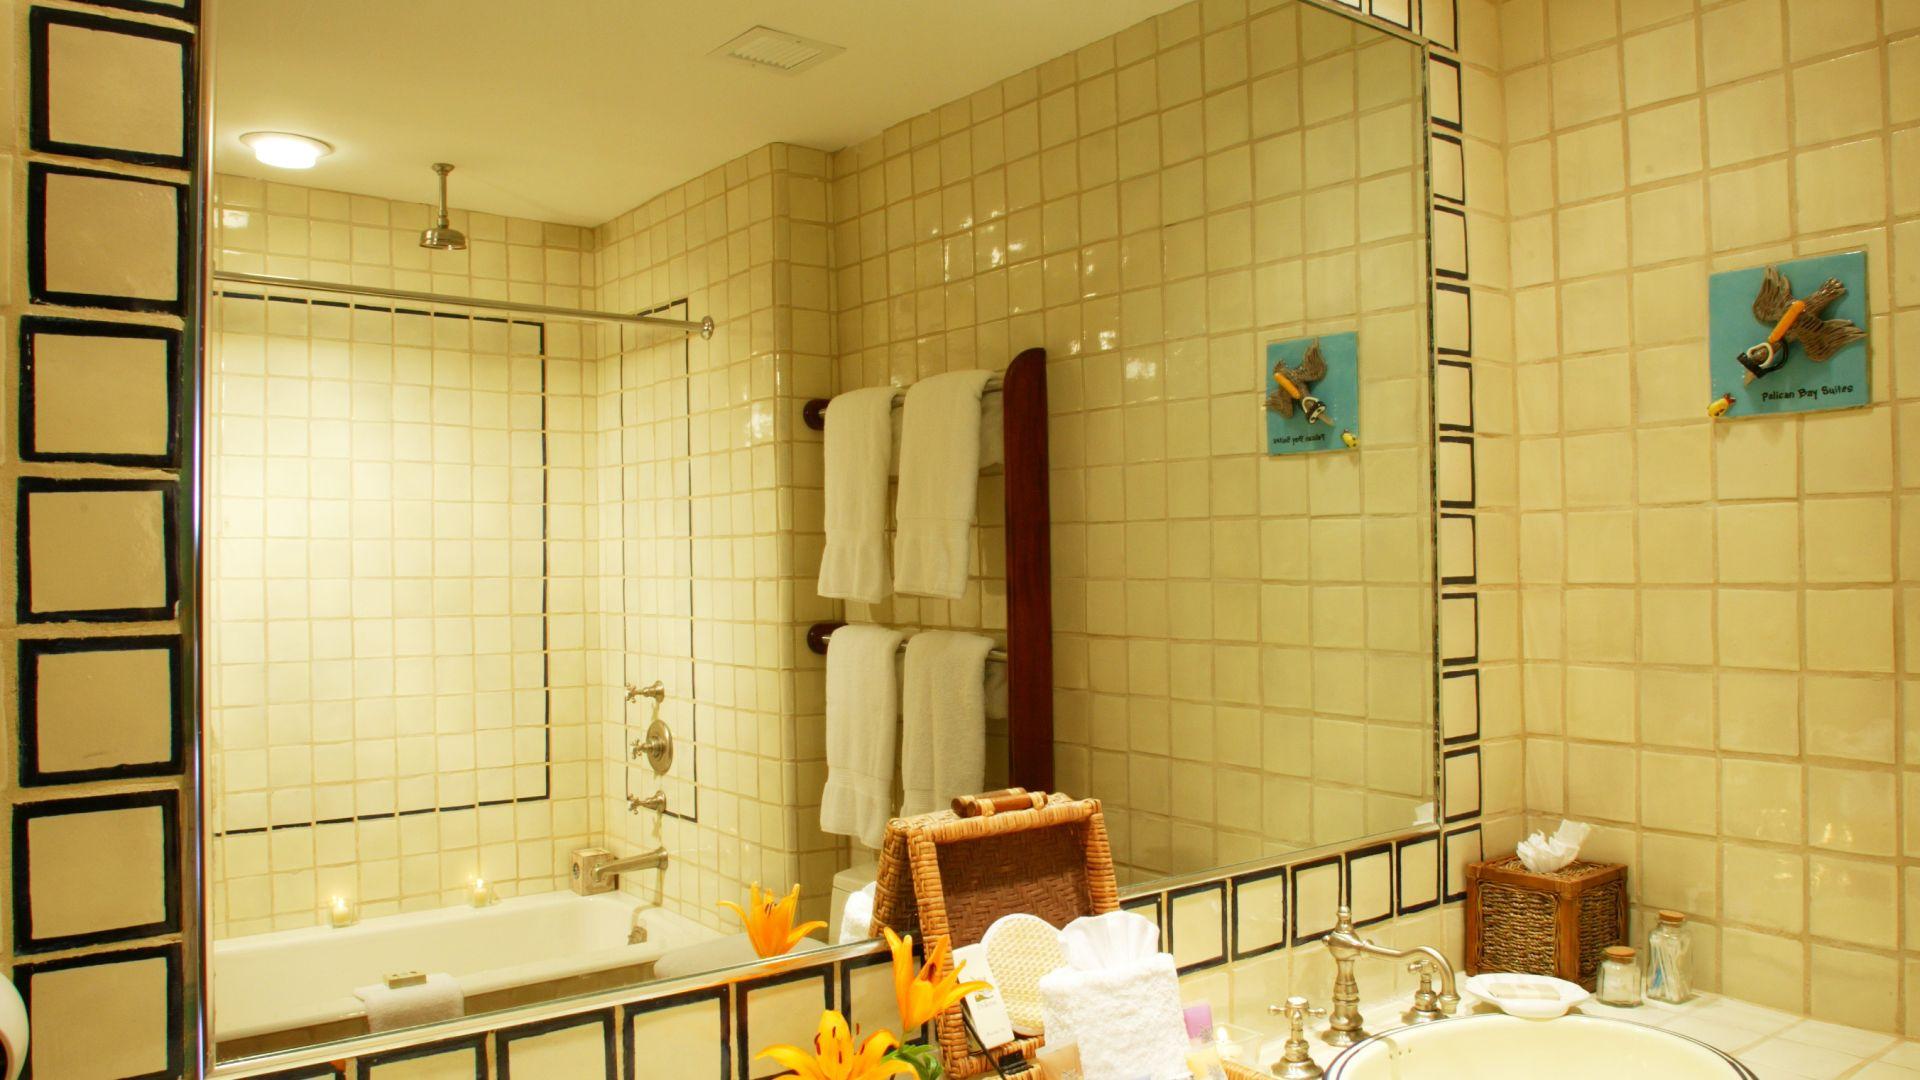 Hotels in Grand Bahama Island | Pelican Bay Hotel